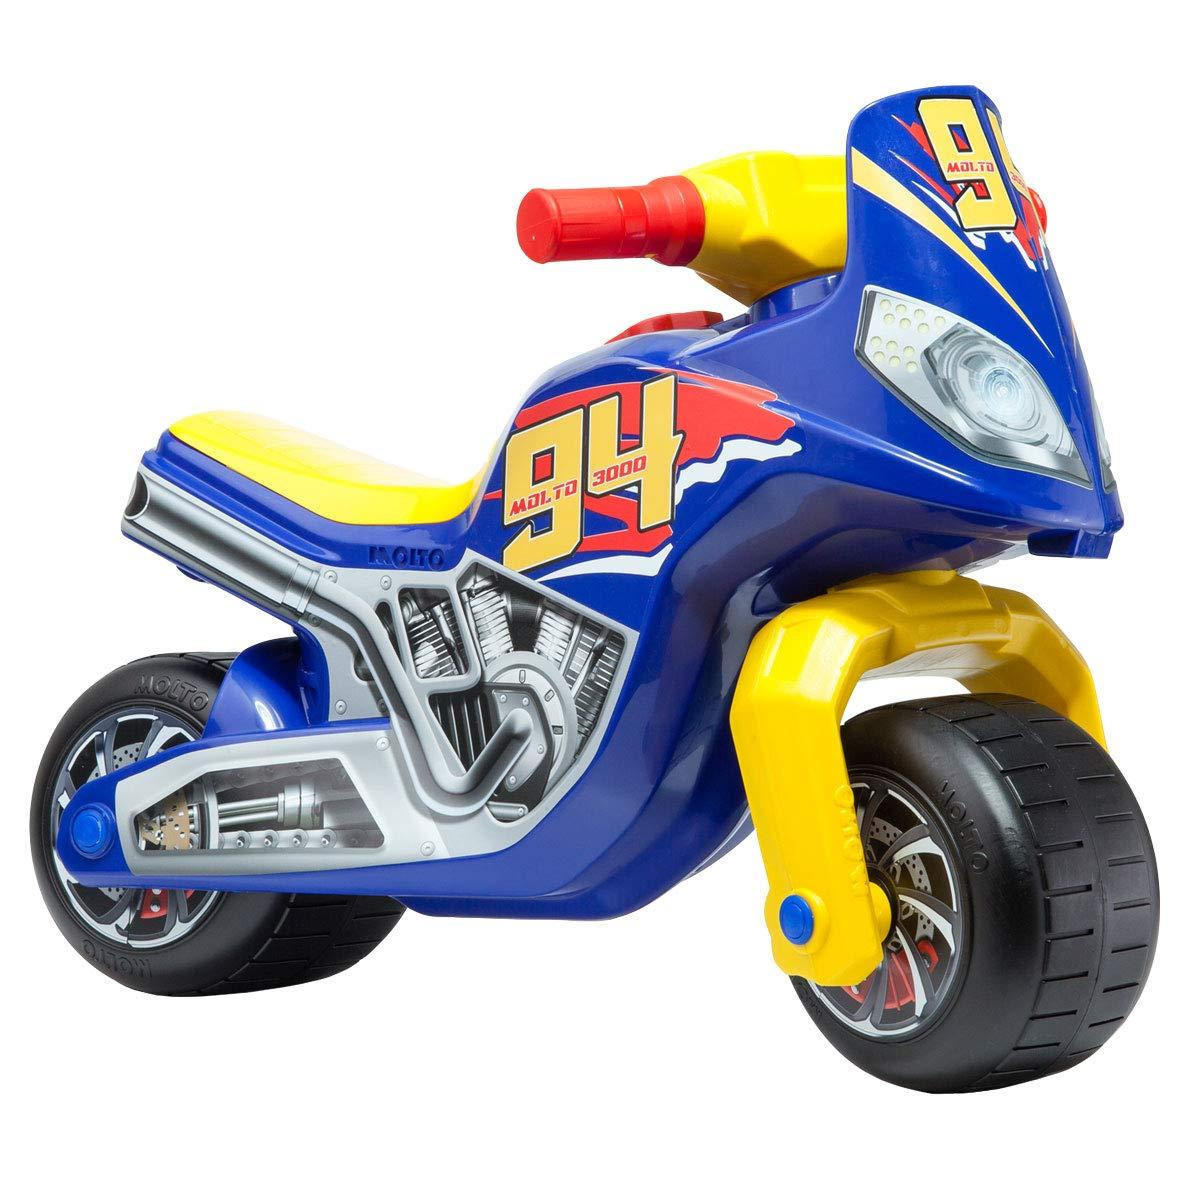 MOLTO CROSS RACE CHICO 18223 - V17520